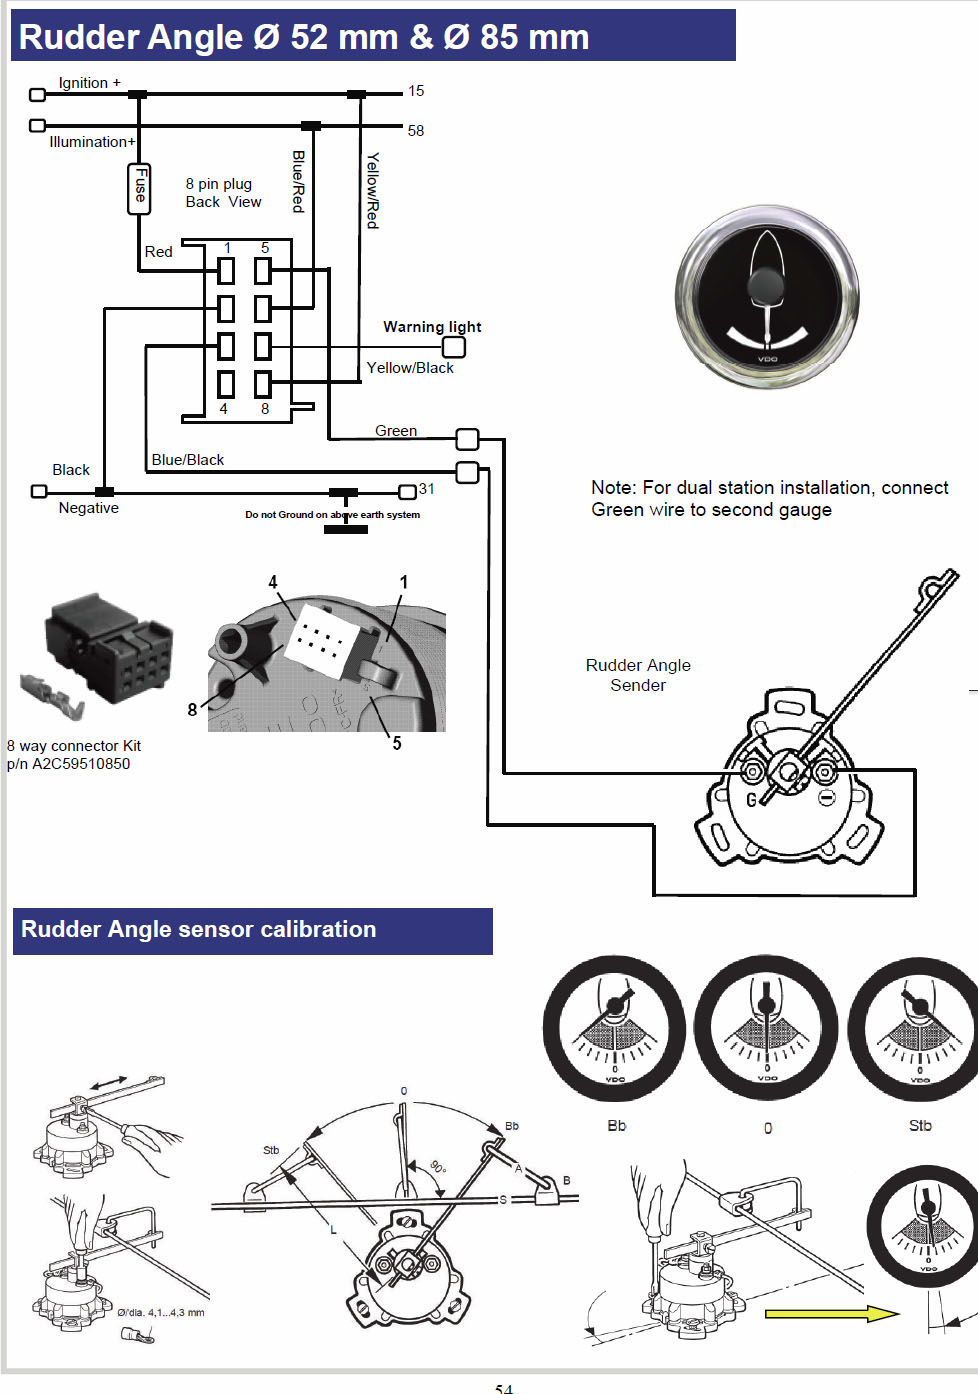 hight resolution of vdo rudder gauge wiring diagram wiring diagram expert vdo rudder gauge wiring diagram vdo rudder angle